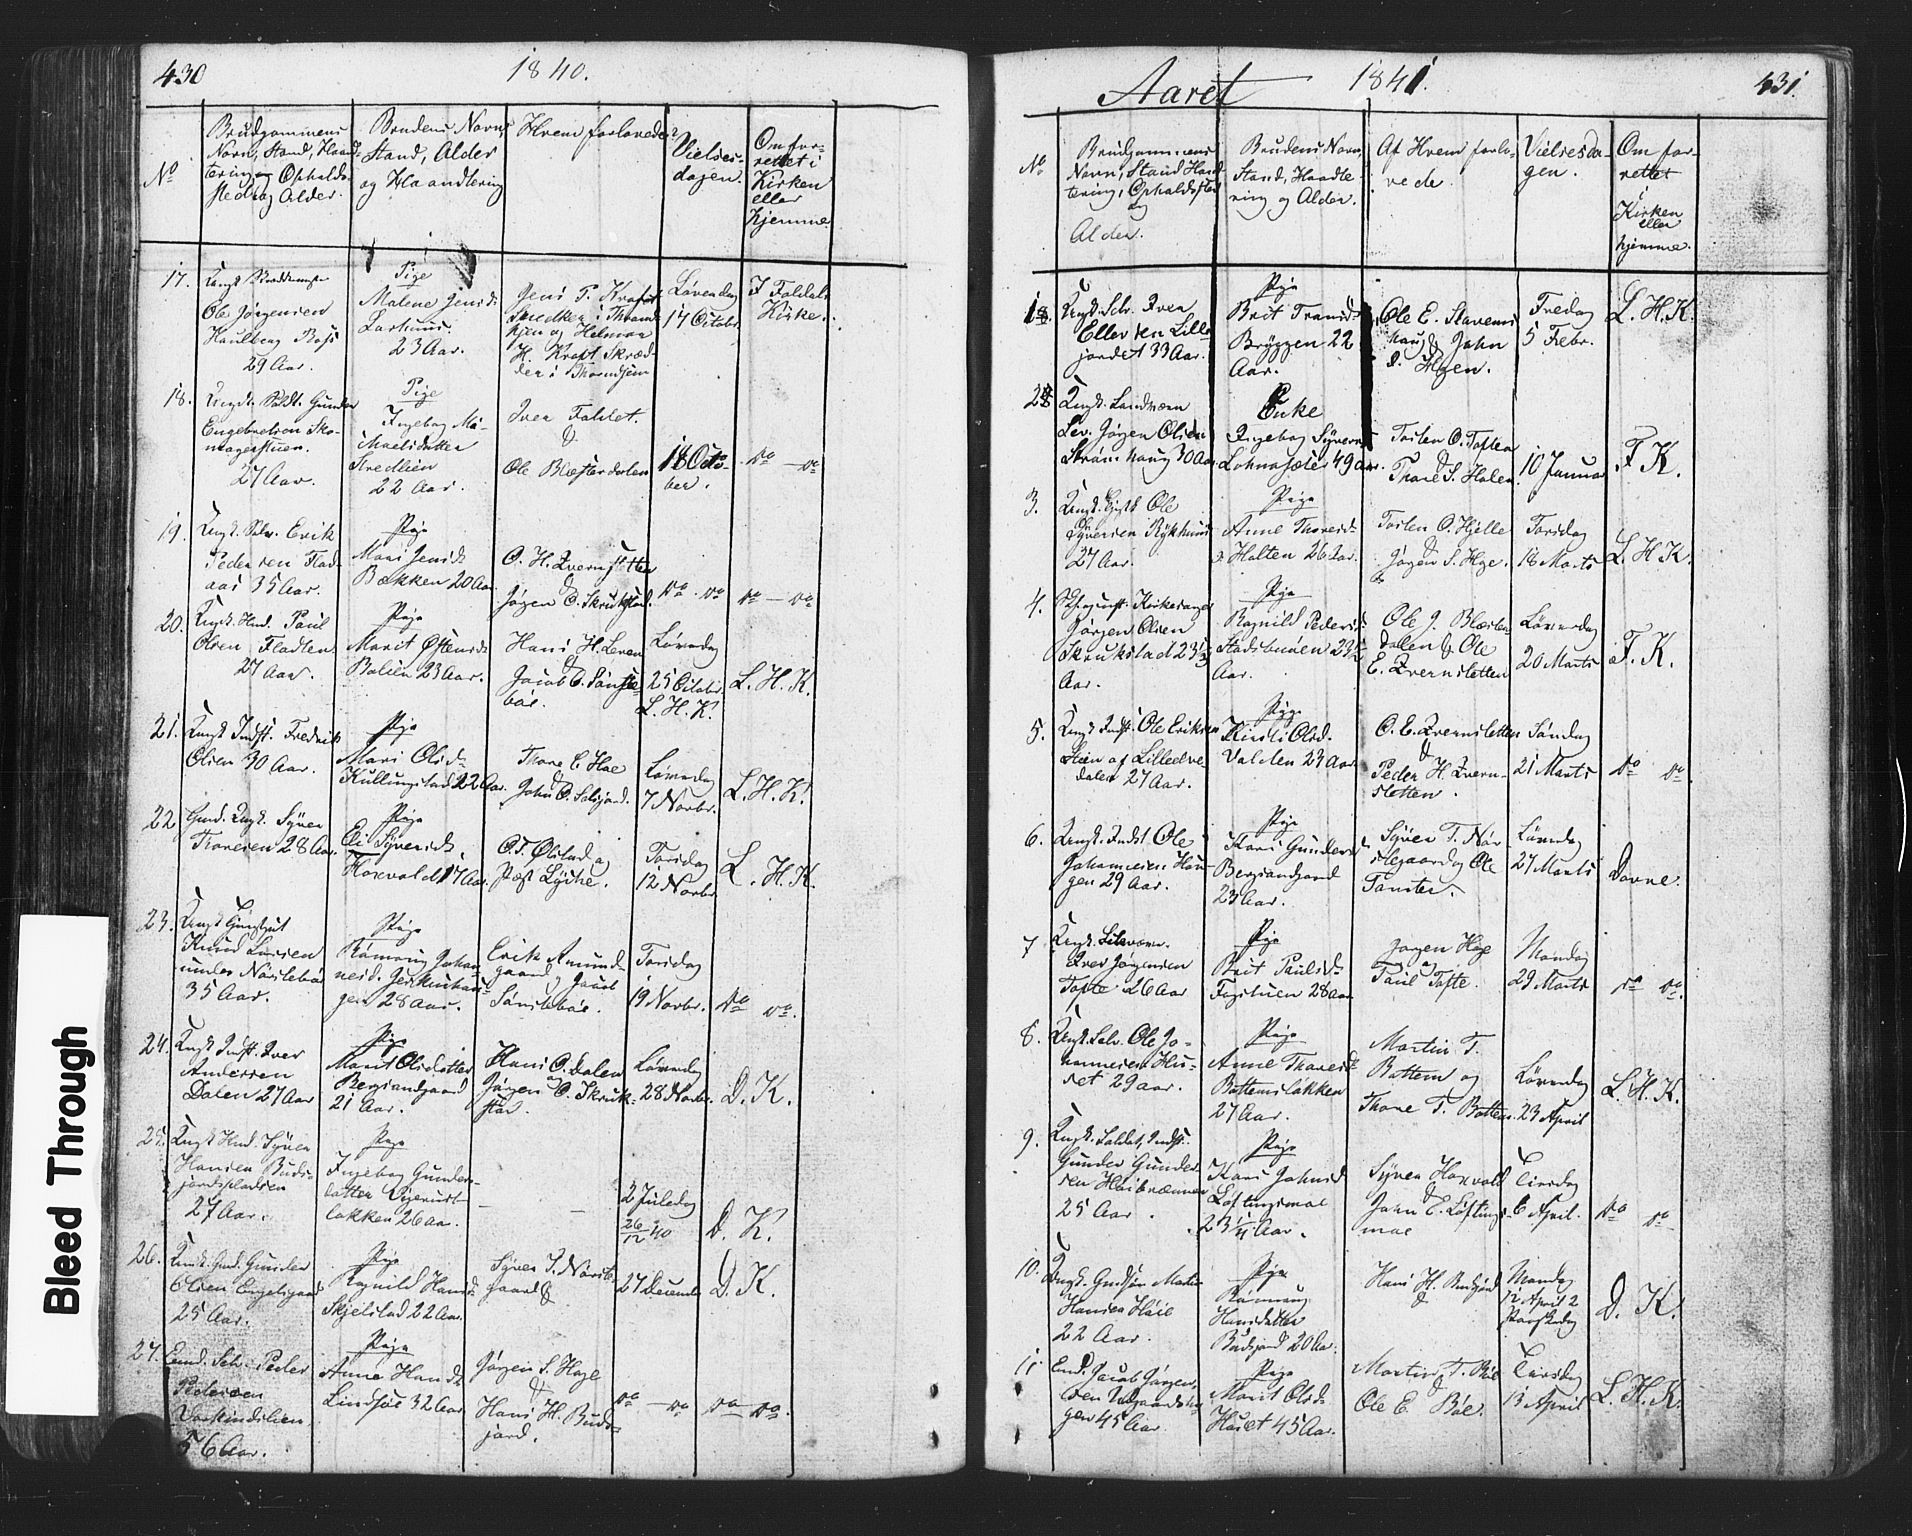 SAH, Lesja prestekontor, Klokkerbok nr. 2, 1832-1850, s. 430-431